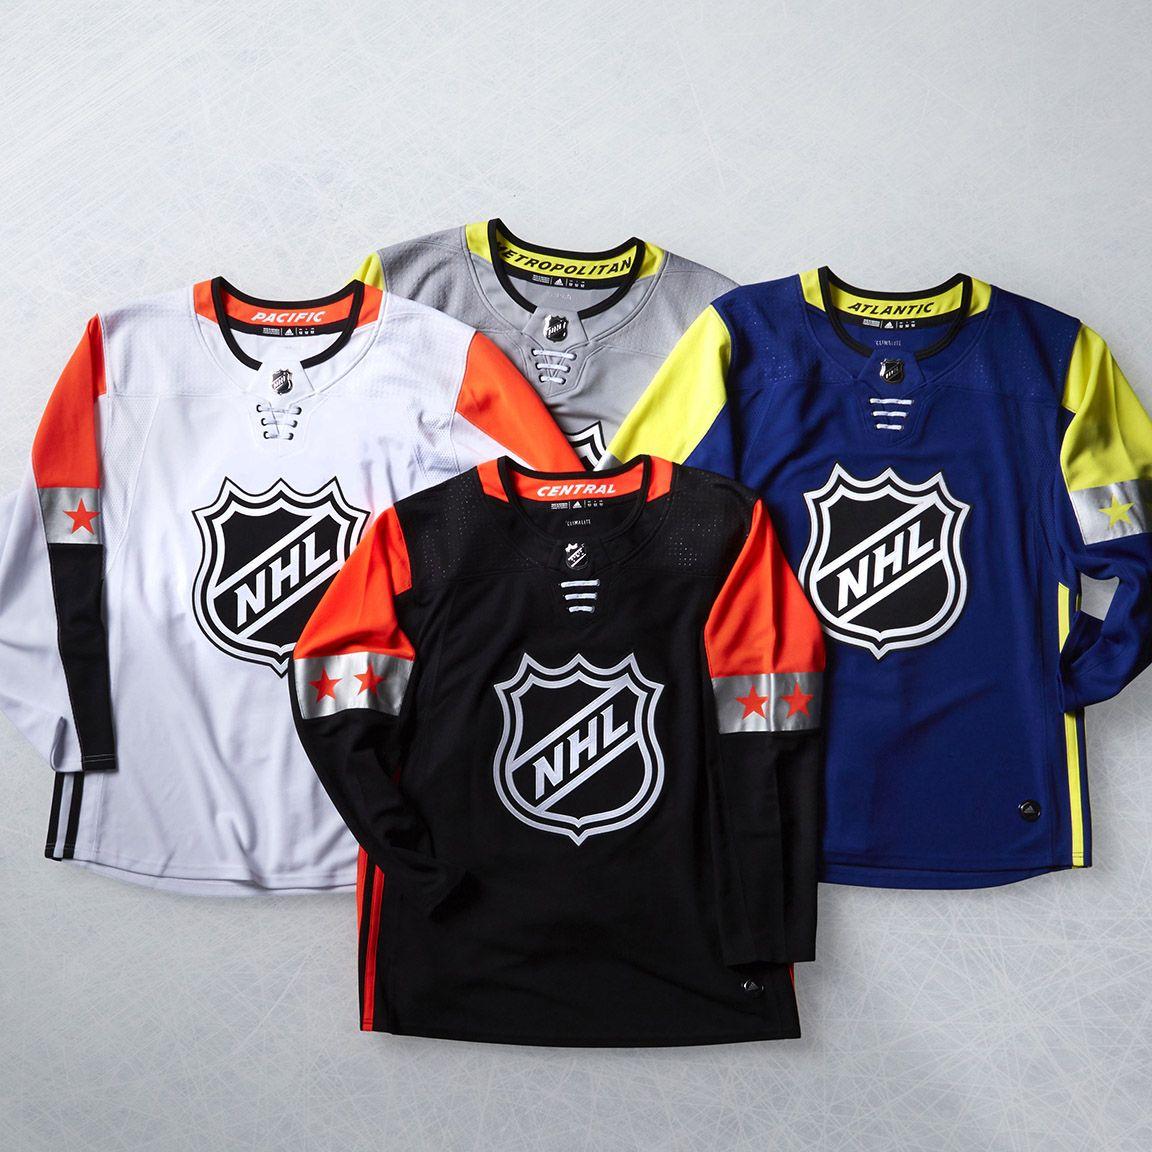 2018 NHL All-Star Game Uniforms Unveiled  b1c8816e376